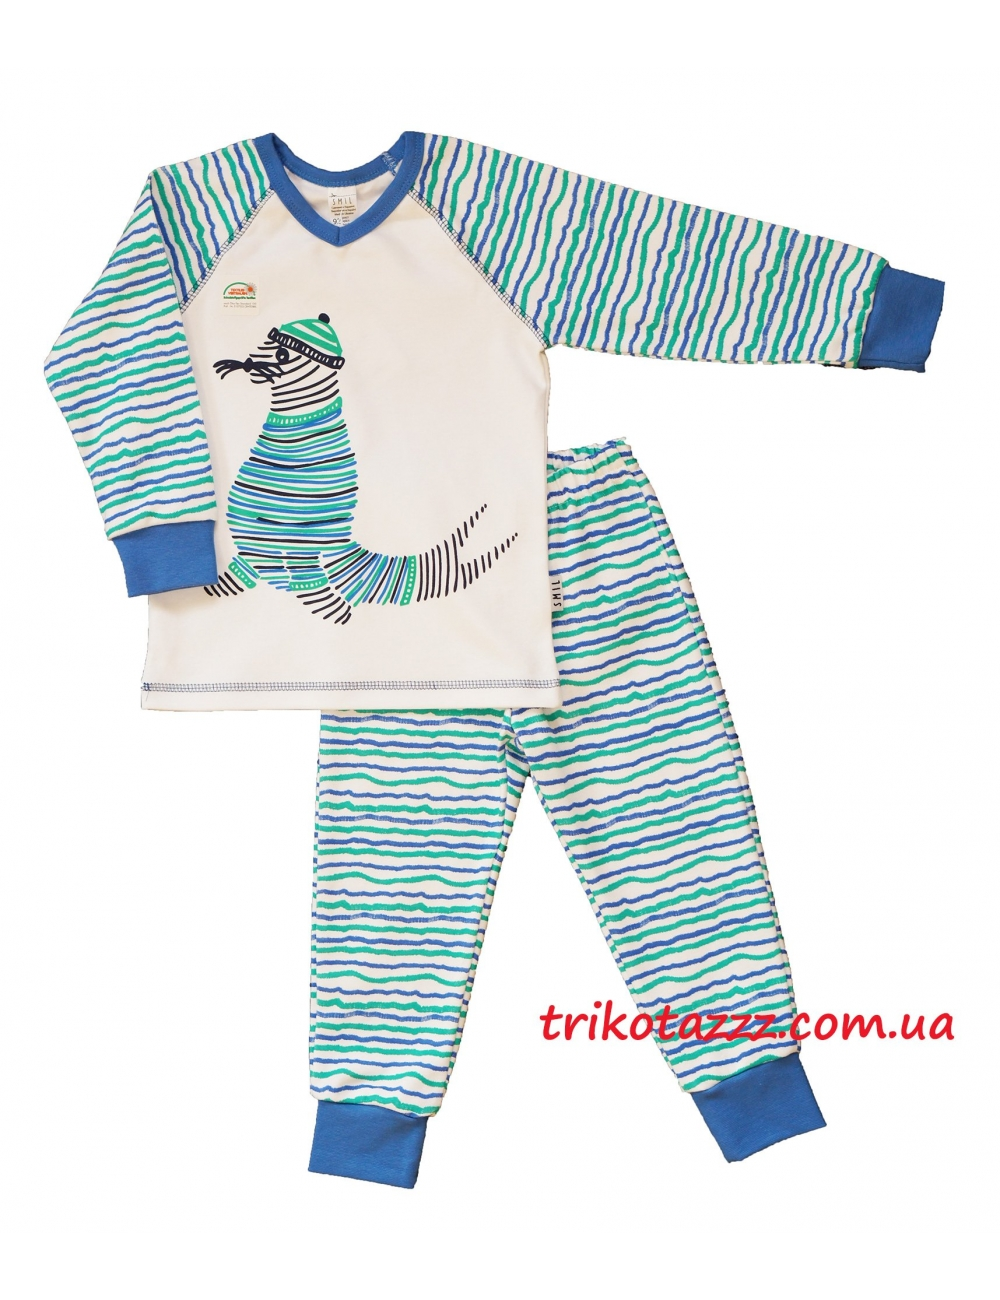 "Пижама для мальчика тм""Смил"" Морж"